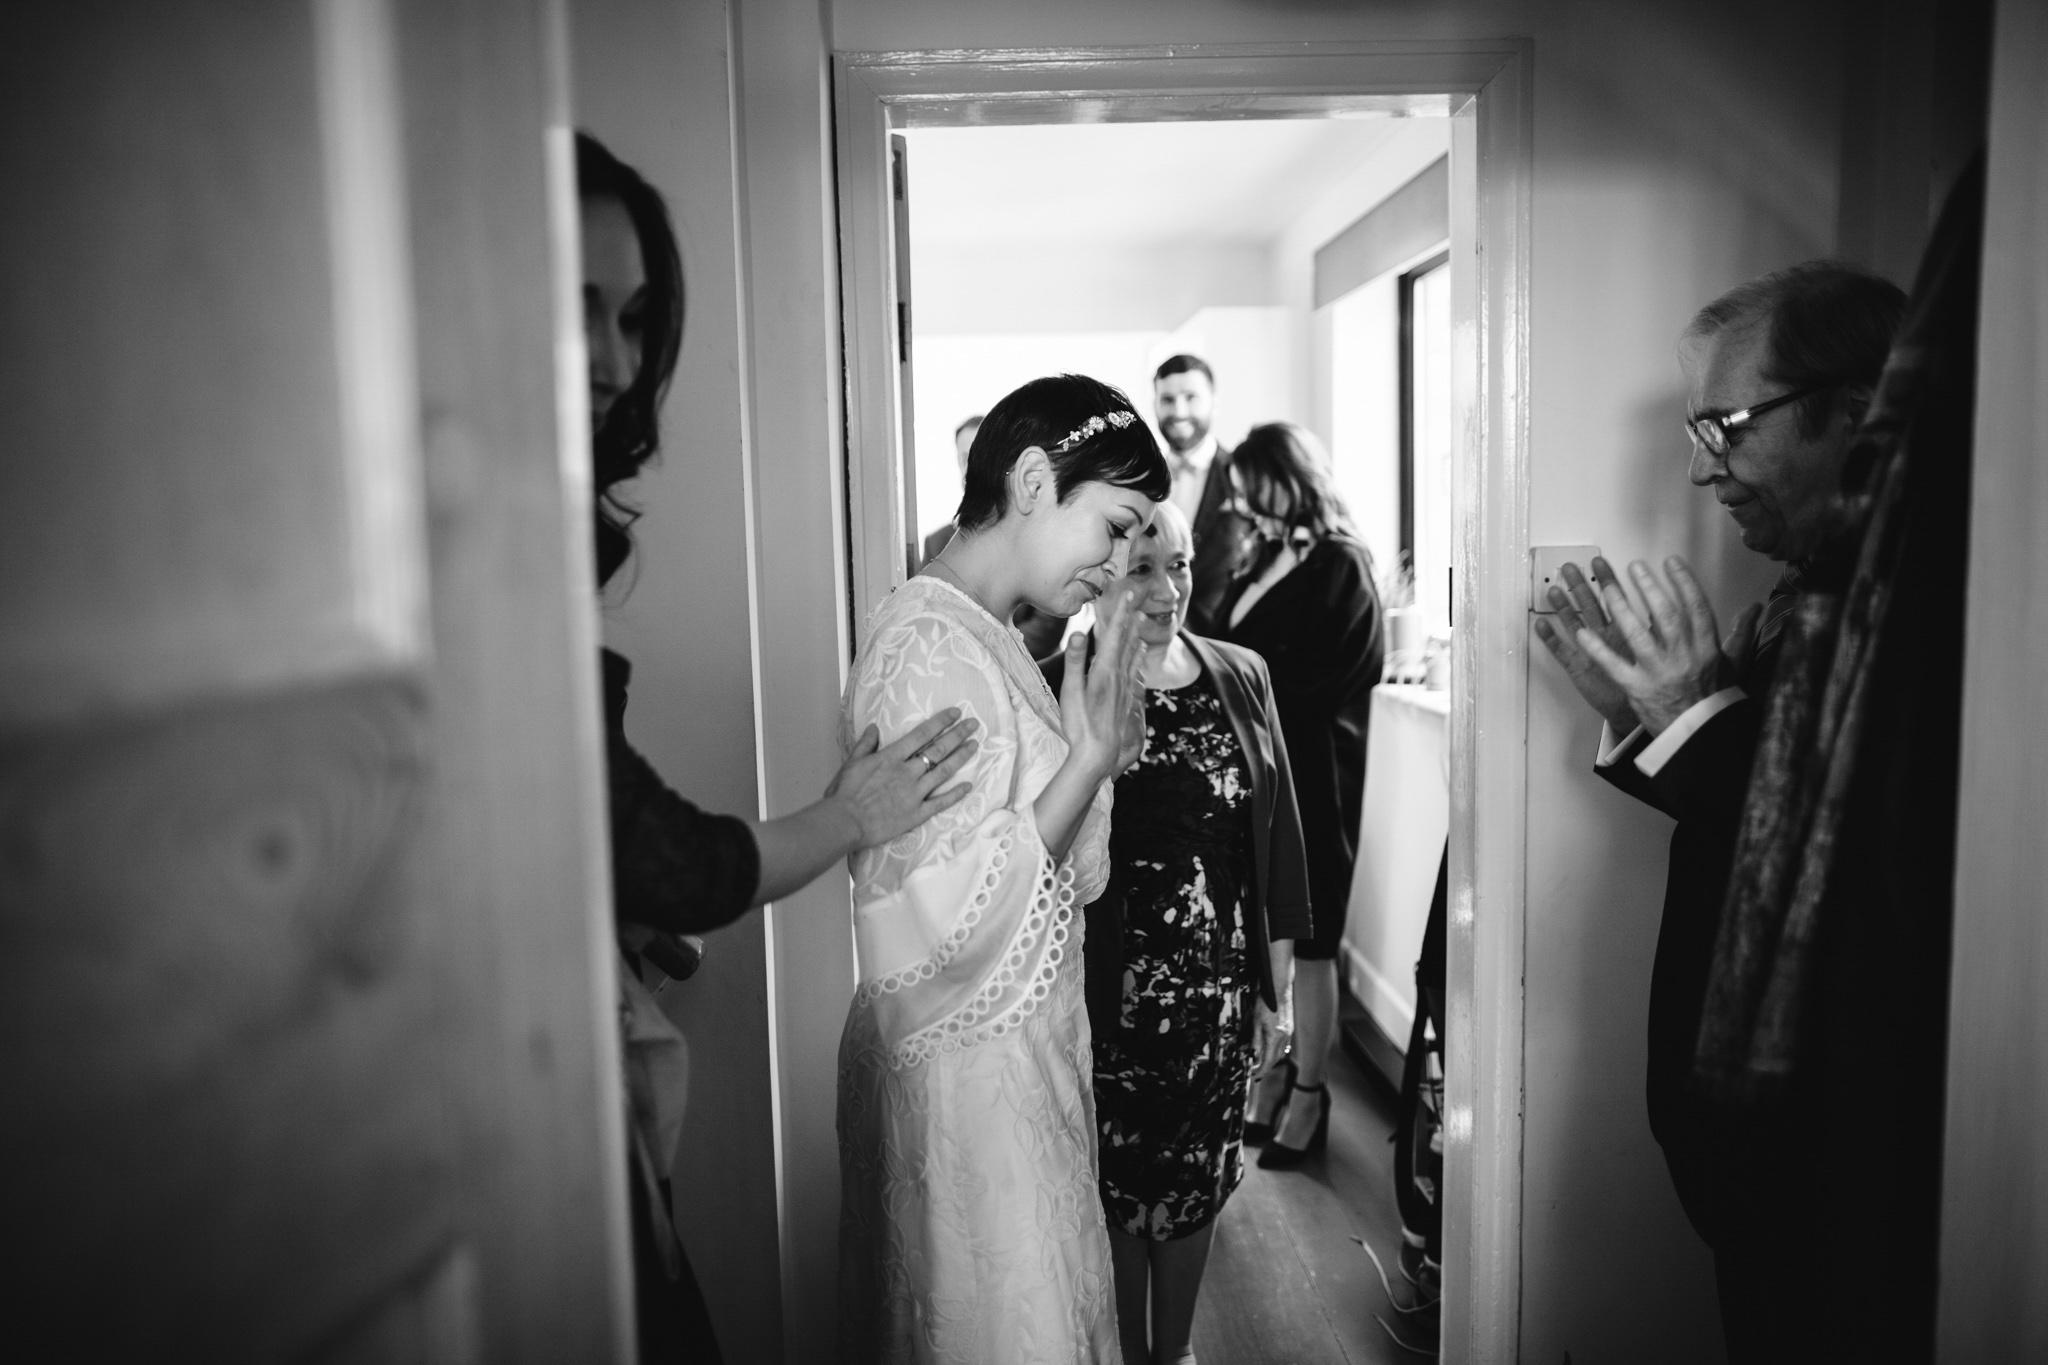 derby-wedding-photographer-camera-hannah-blog-189.jpg